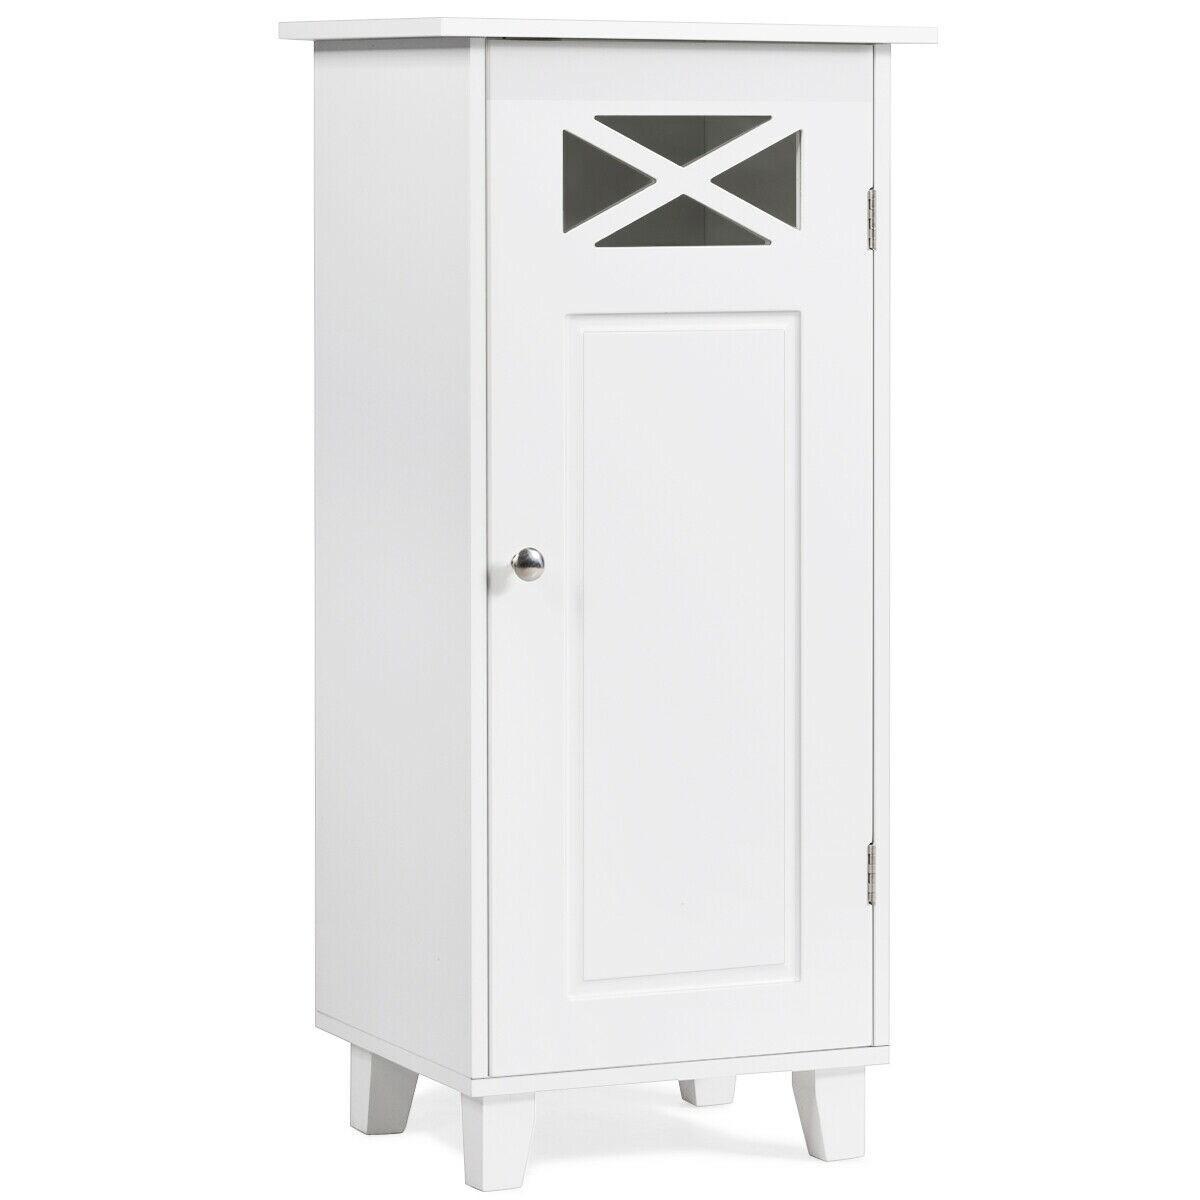 Gymax Bathroom Cabinet